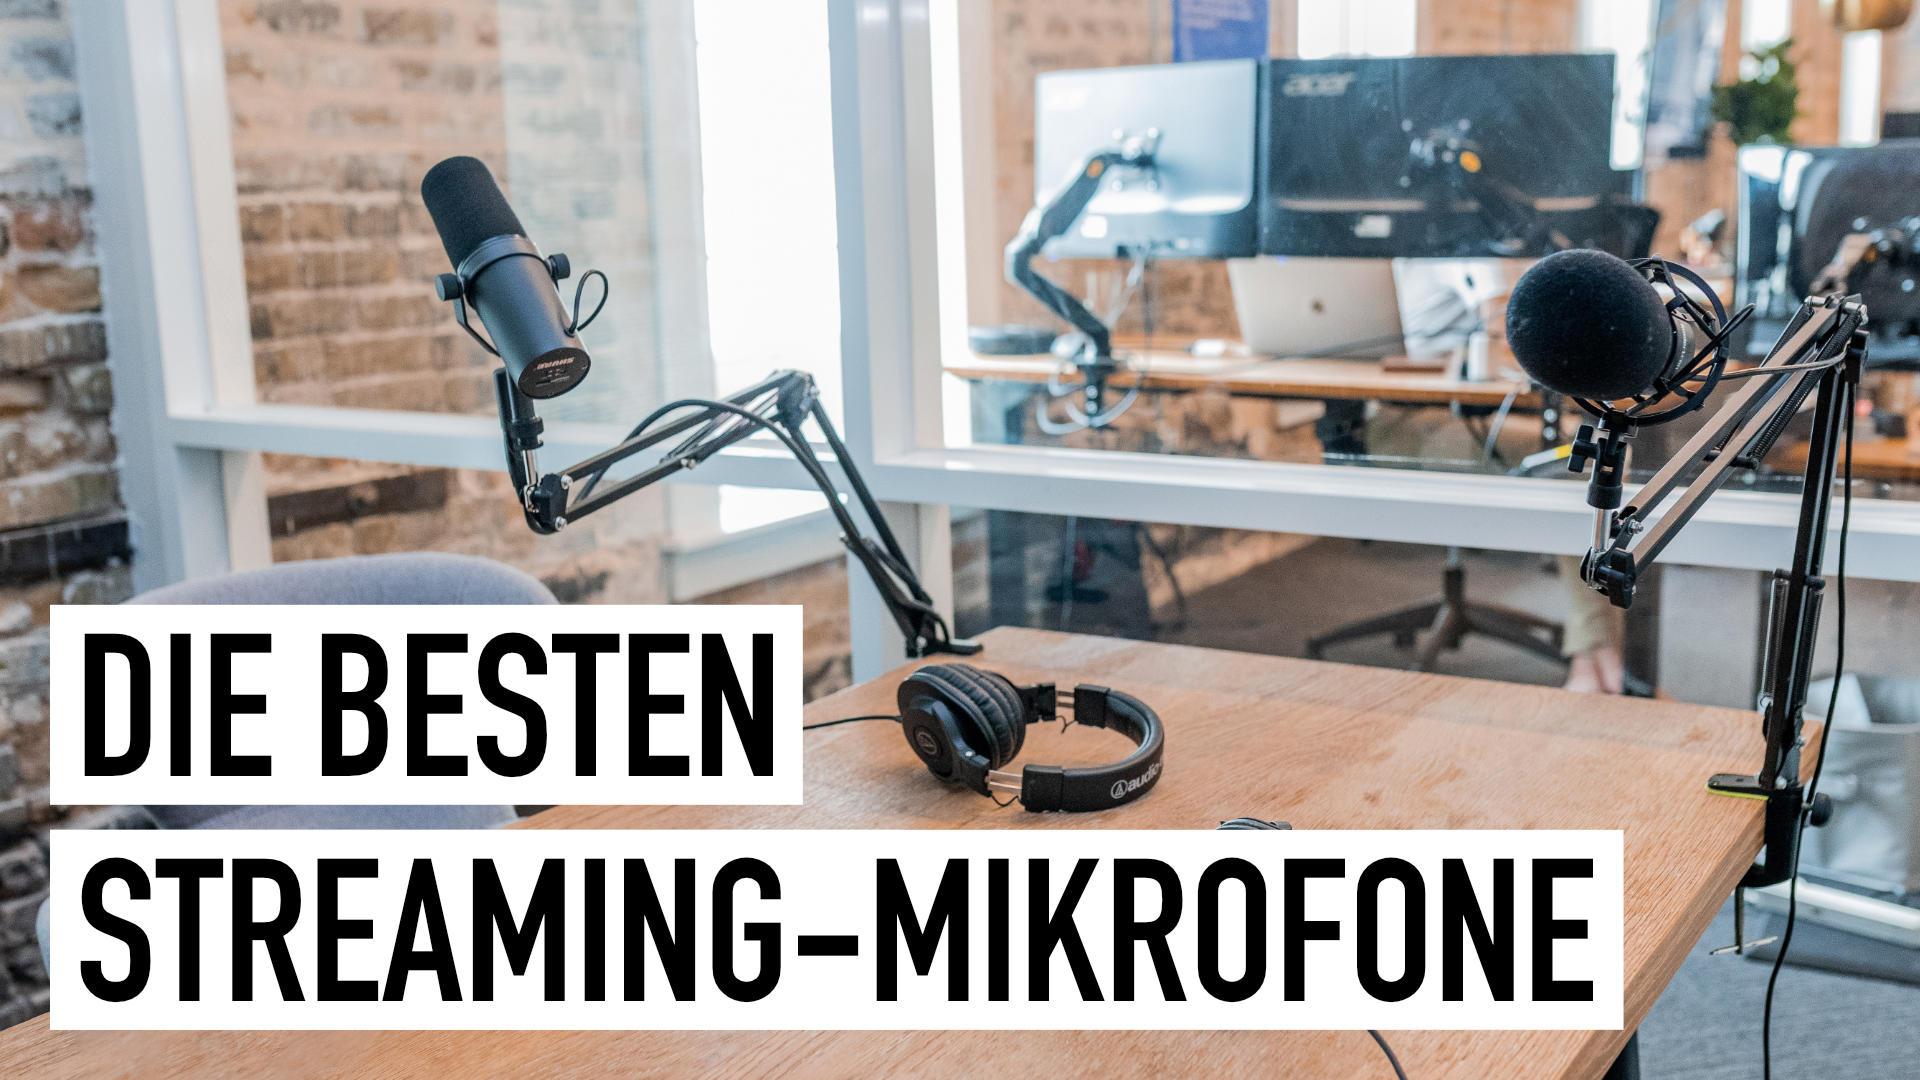 Streaming Mikrofon: Die besten Modelle für perfekten Klang